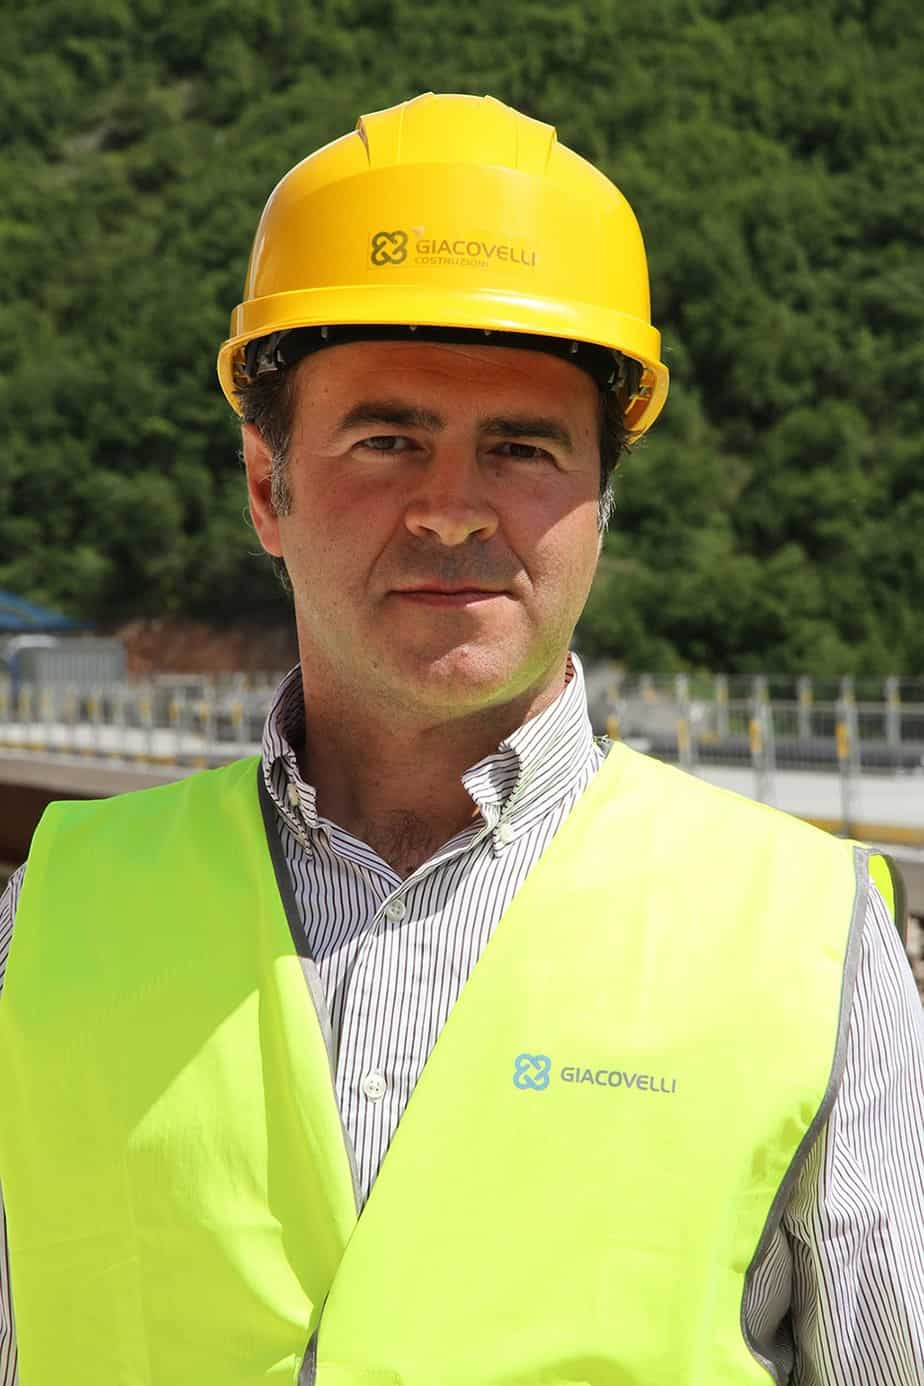 L'Ing. Edgar Micheluzzi, Direttore Tecnico dell'Impresa Giacovelli Srl